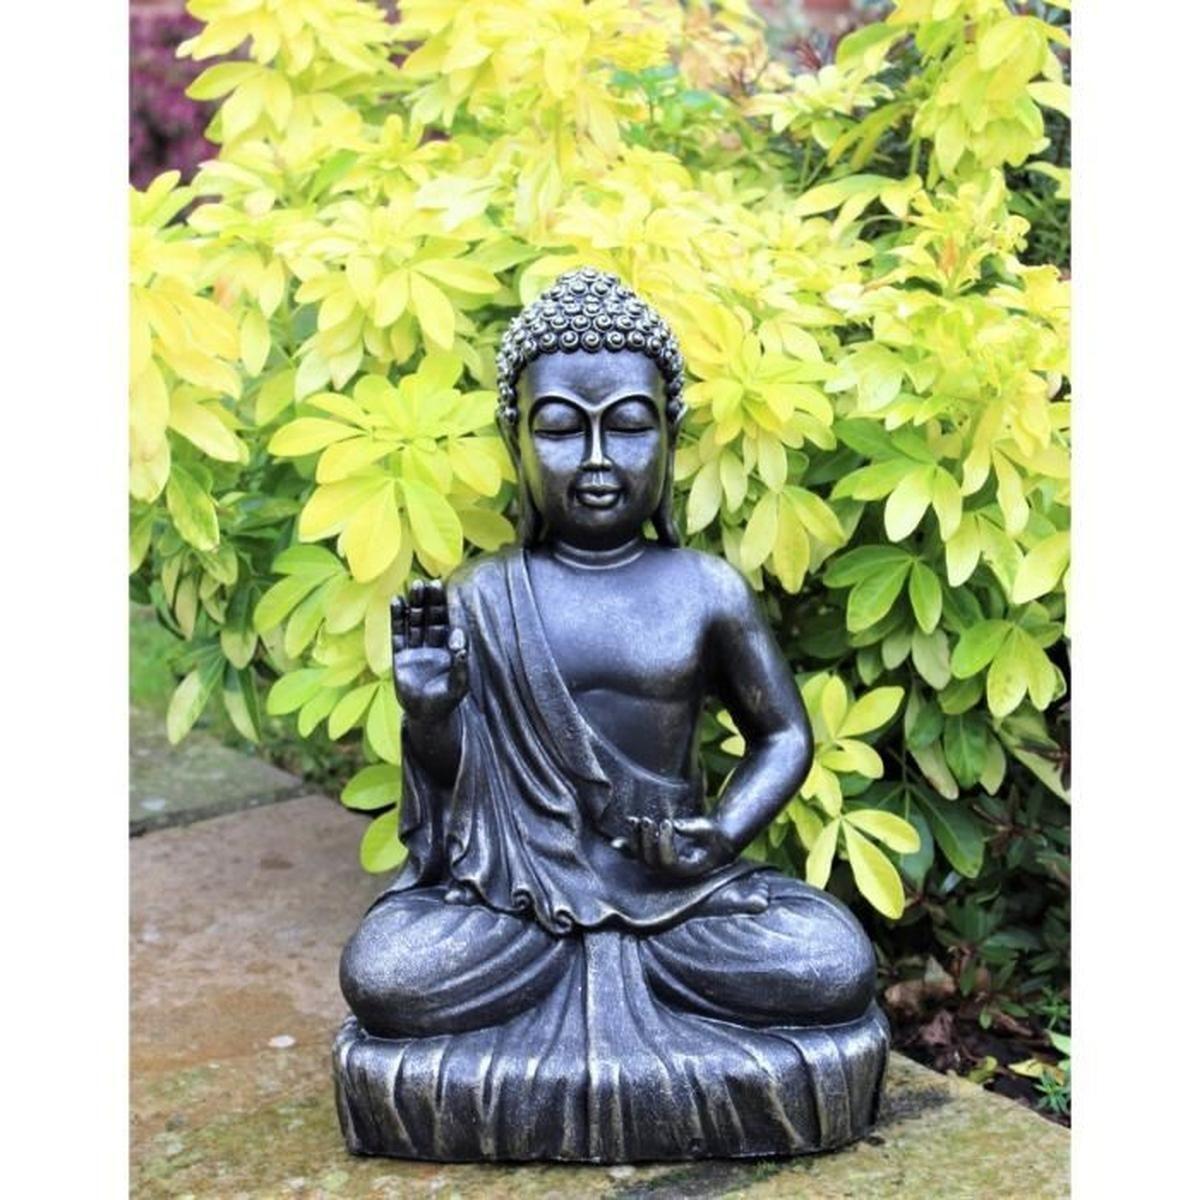 Gris Clair Jardin Figurines Relaxdays Statue De Bouddha ... avec Bouddha Deco Jardin